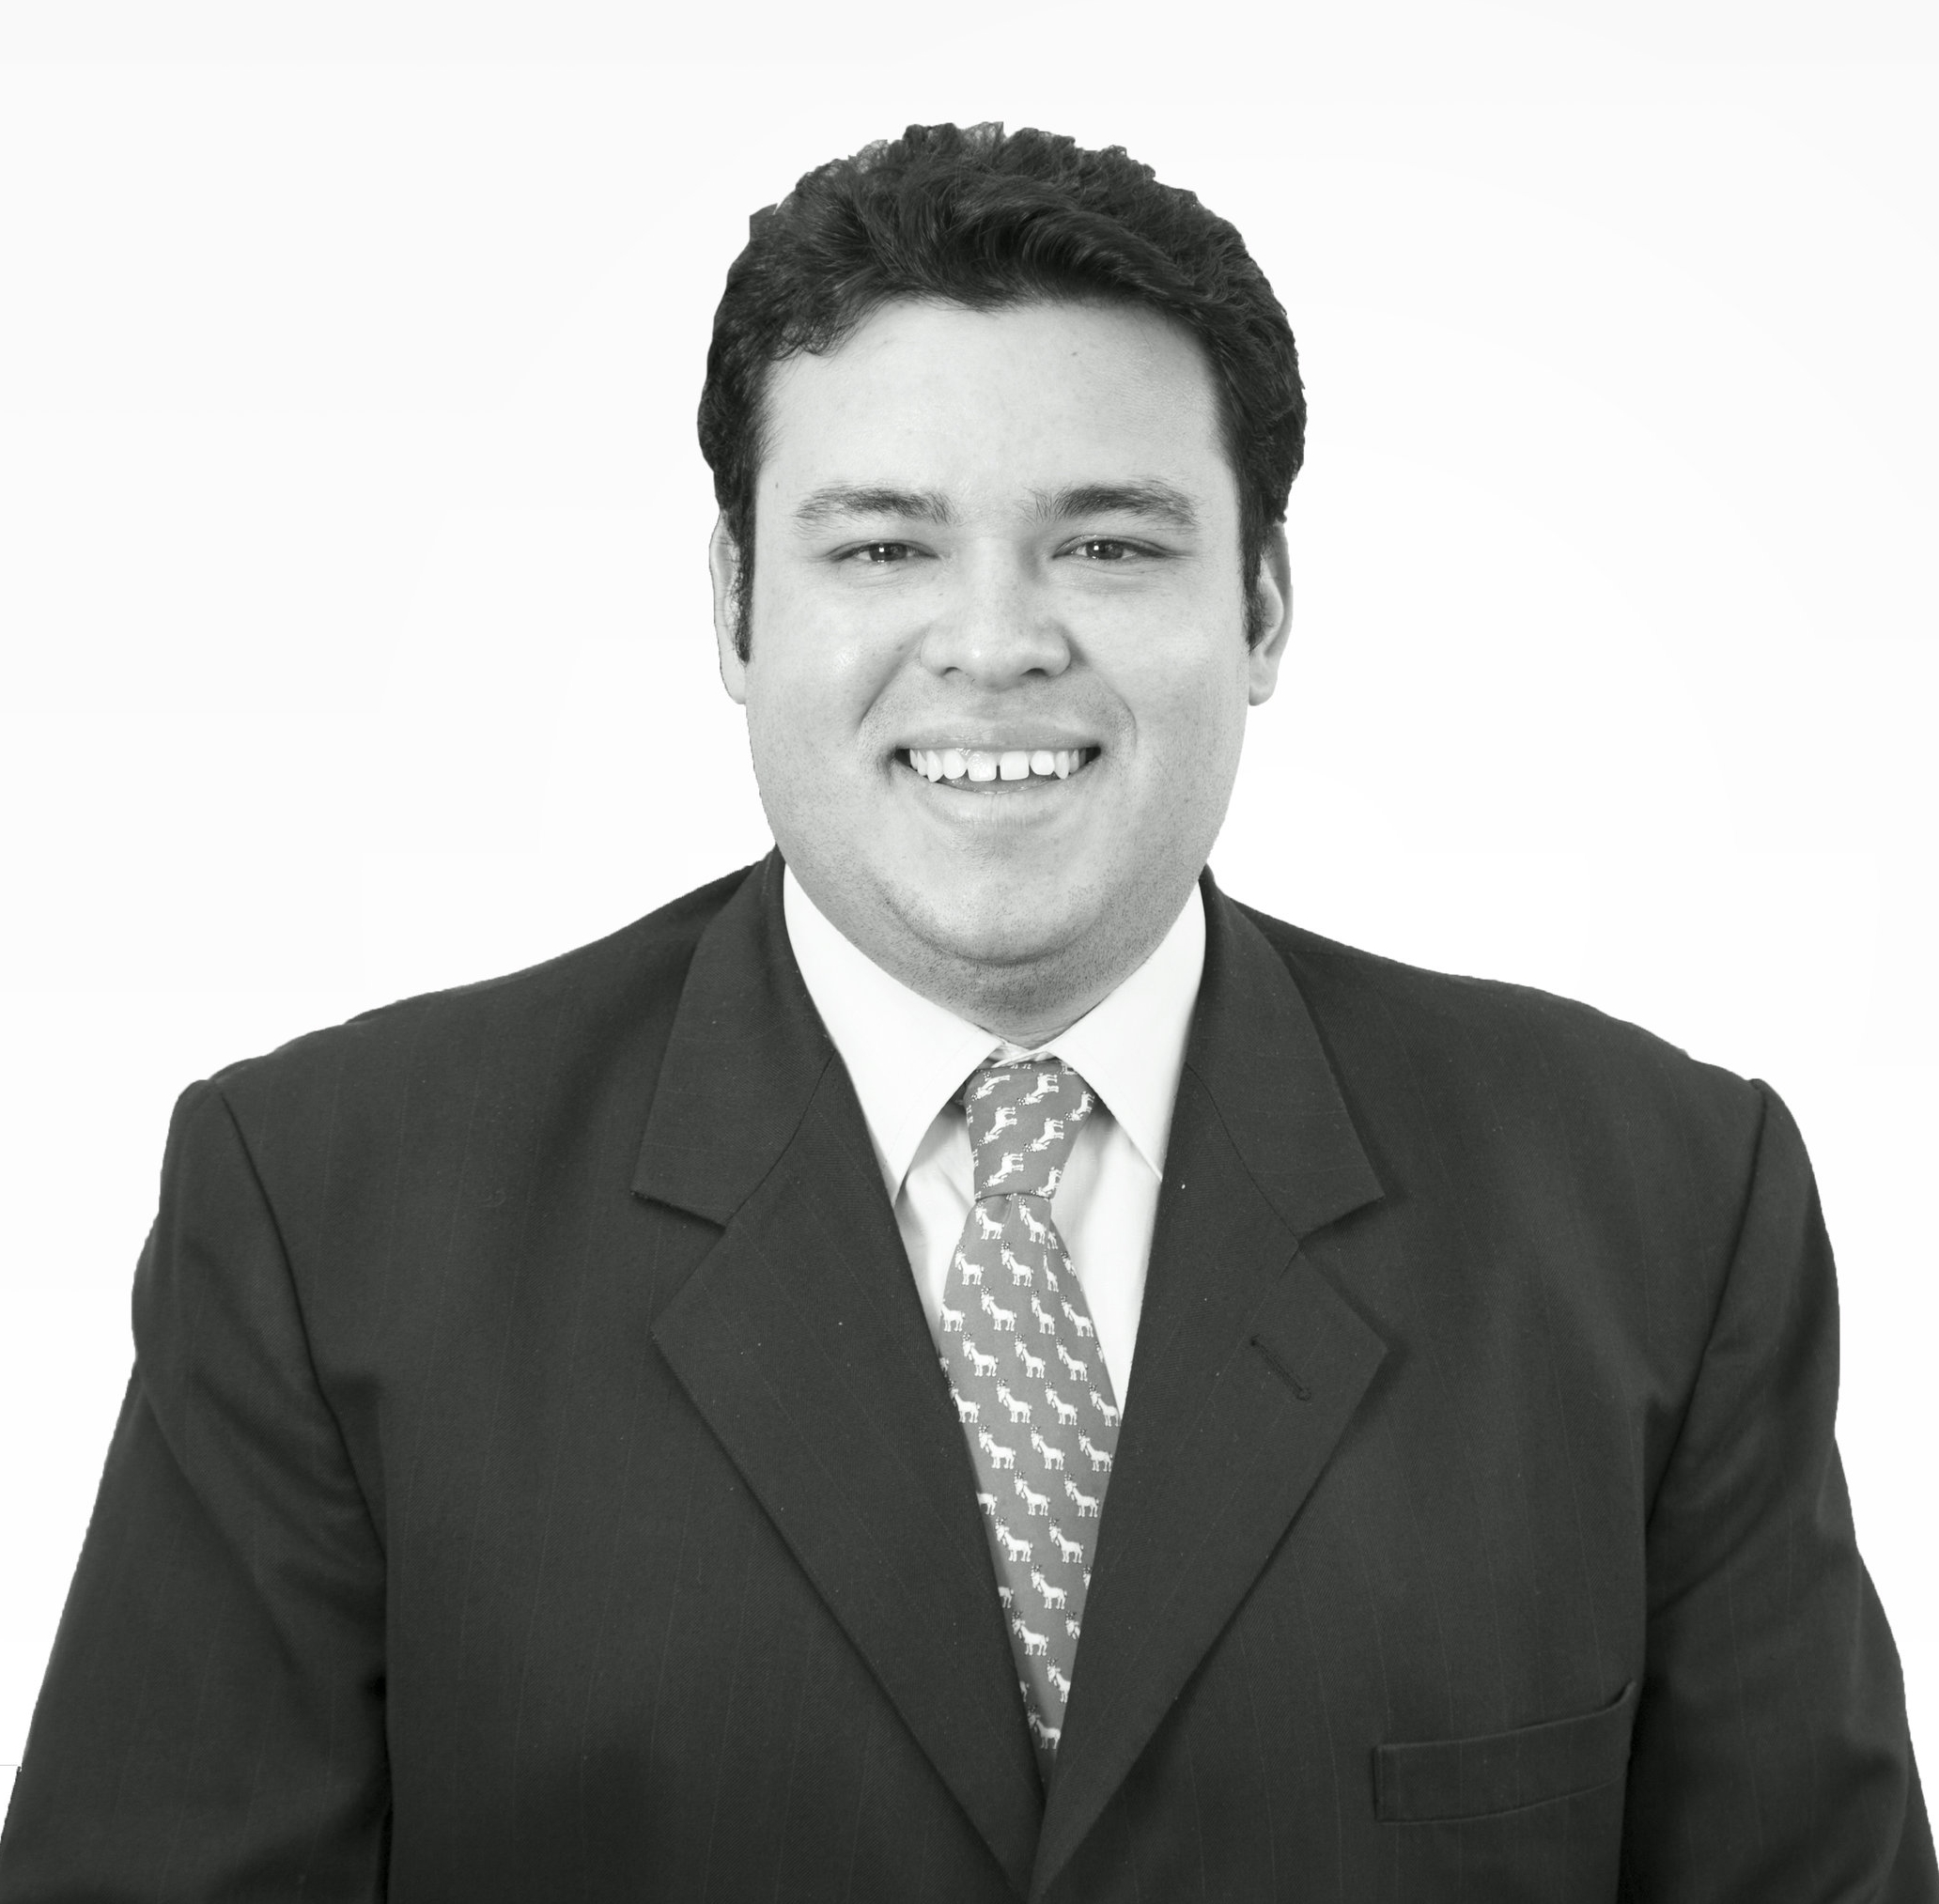 juan camilo Velazquez